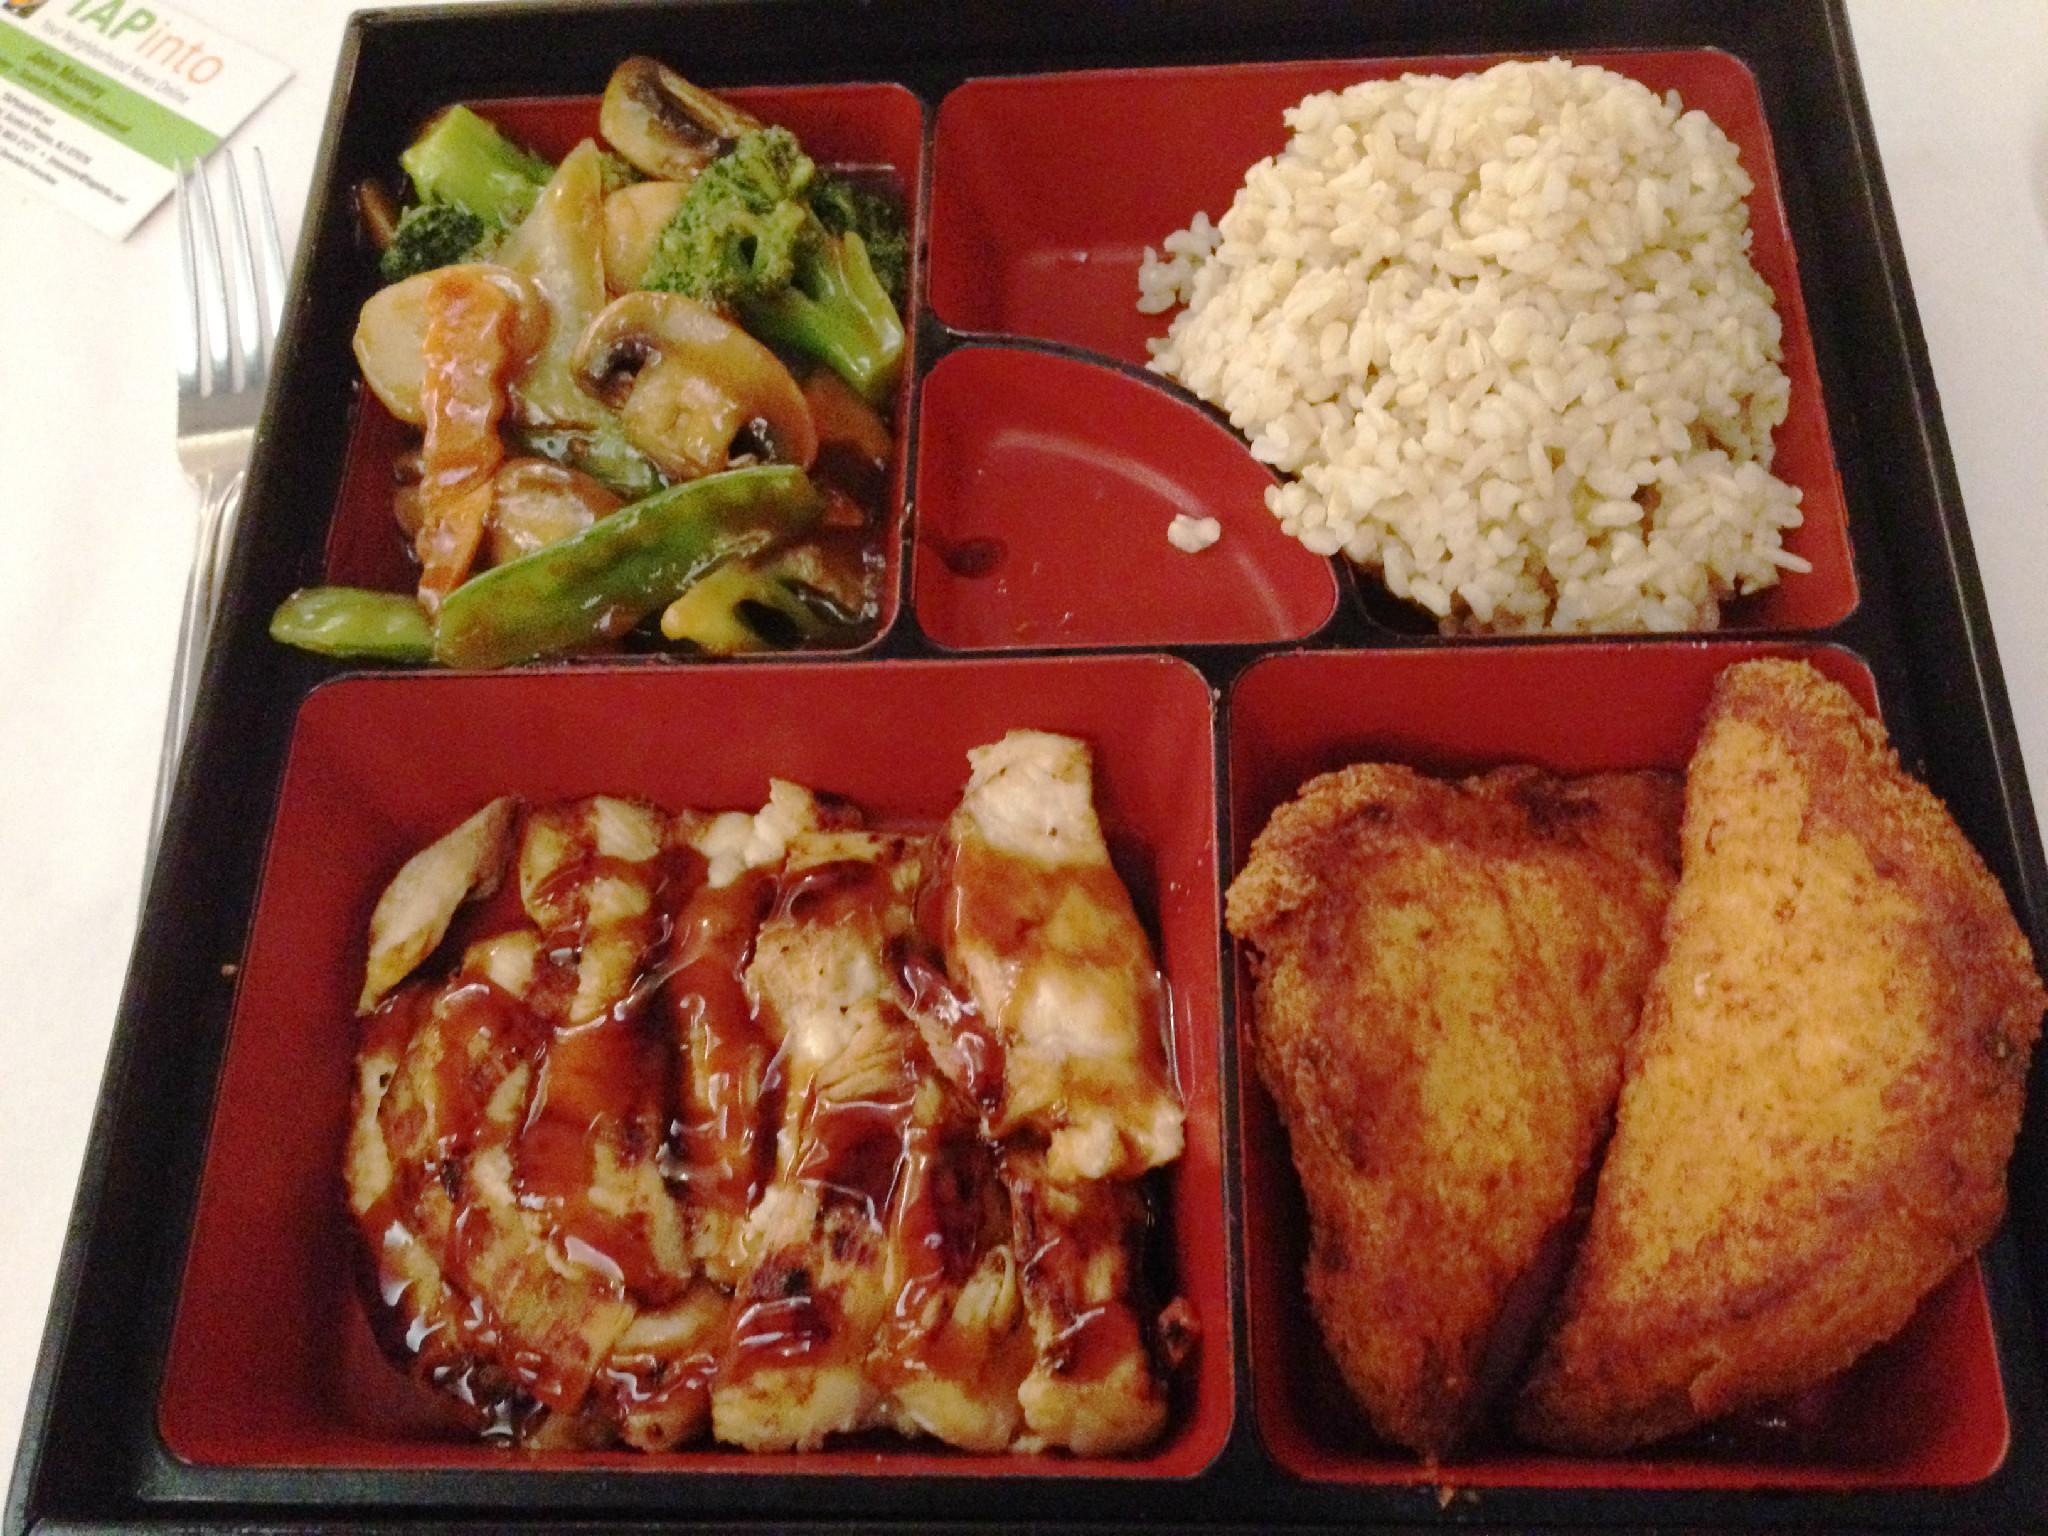 c6b12b5f0db0e26955bb_Jade_Isle_box_lunch.jpg